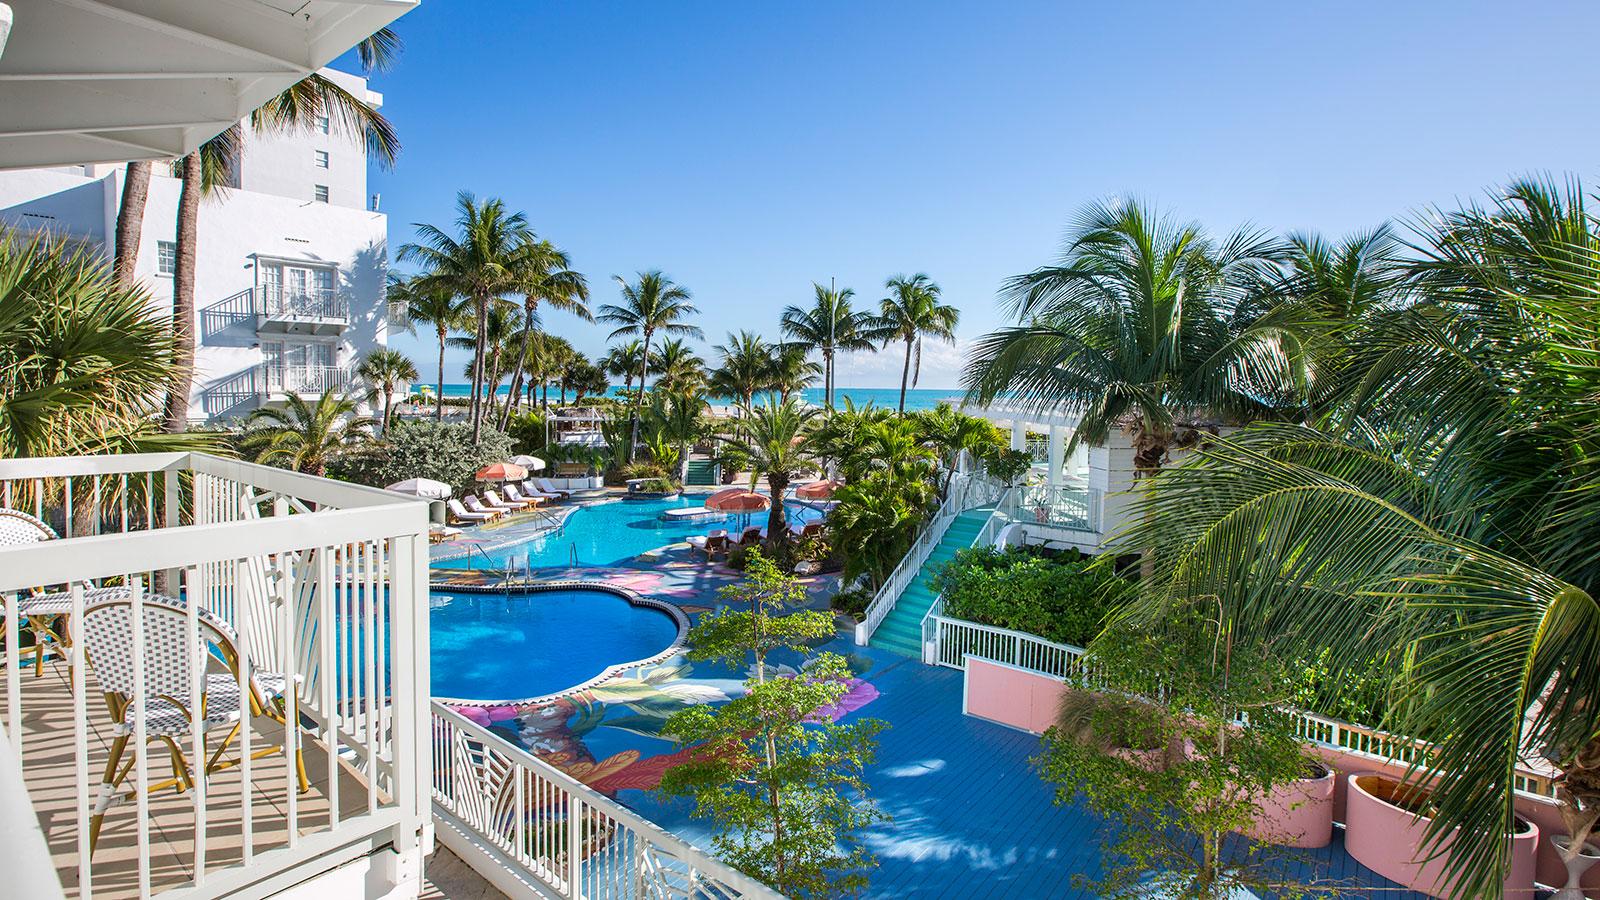 Exterior daytime of Caribe Hilton in San Juan, Puerto Rico